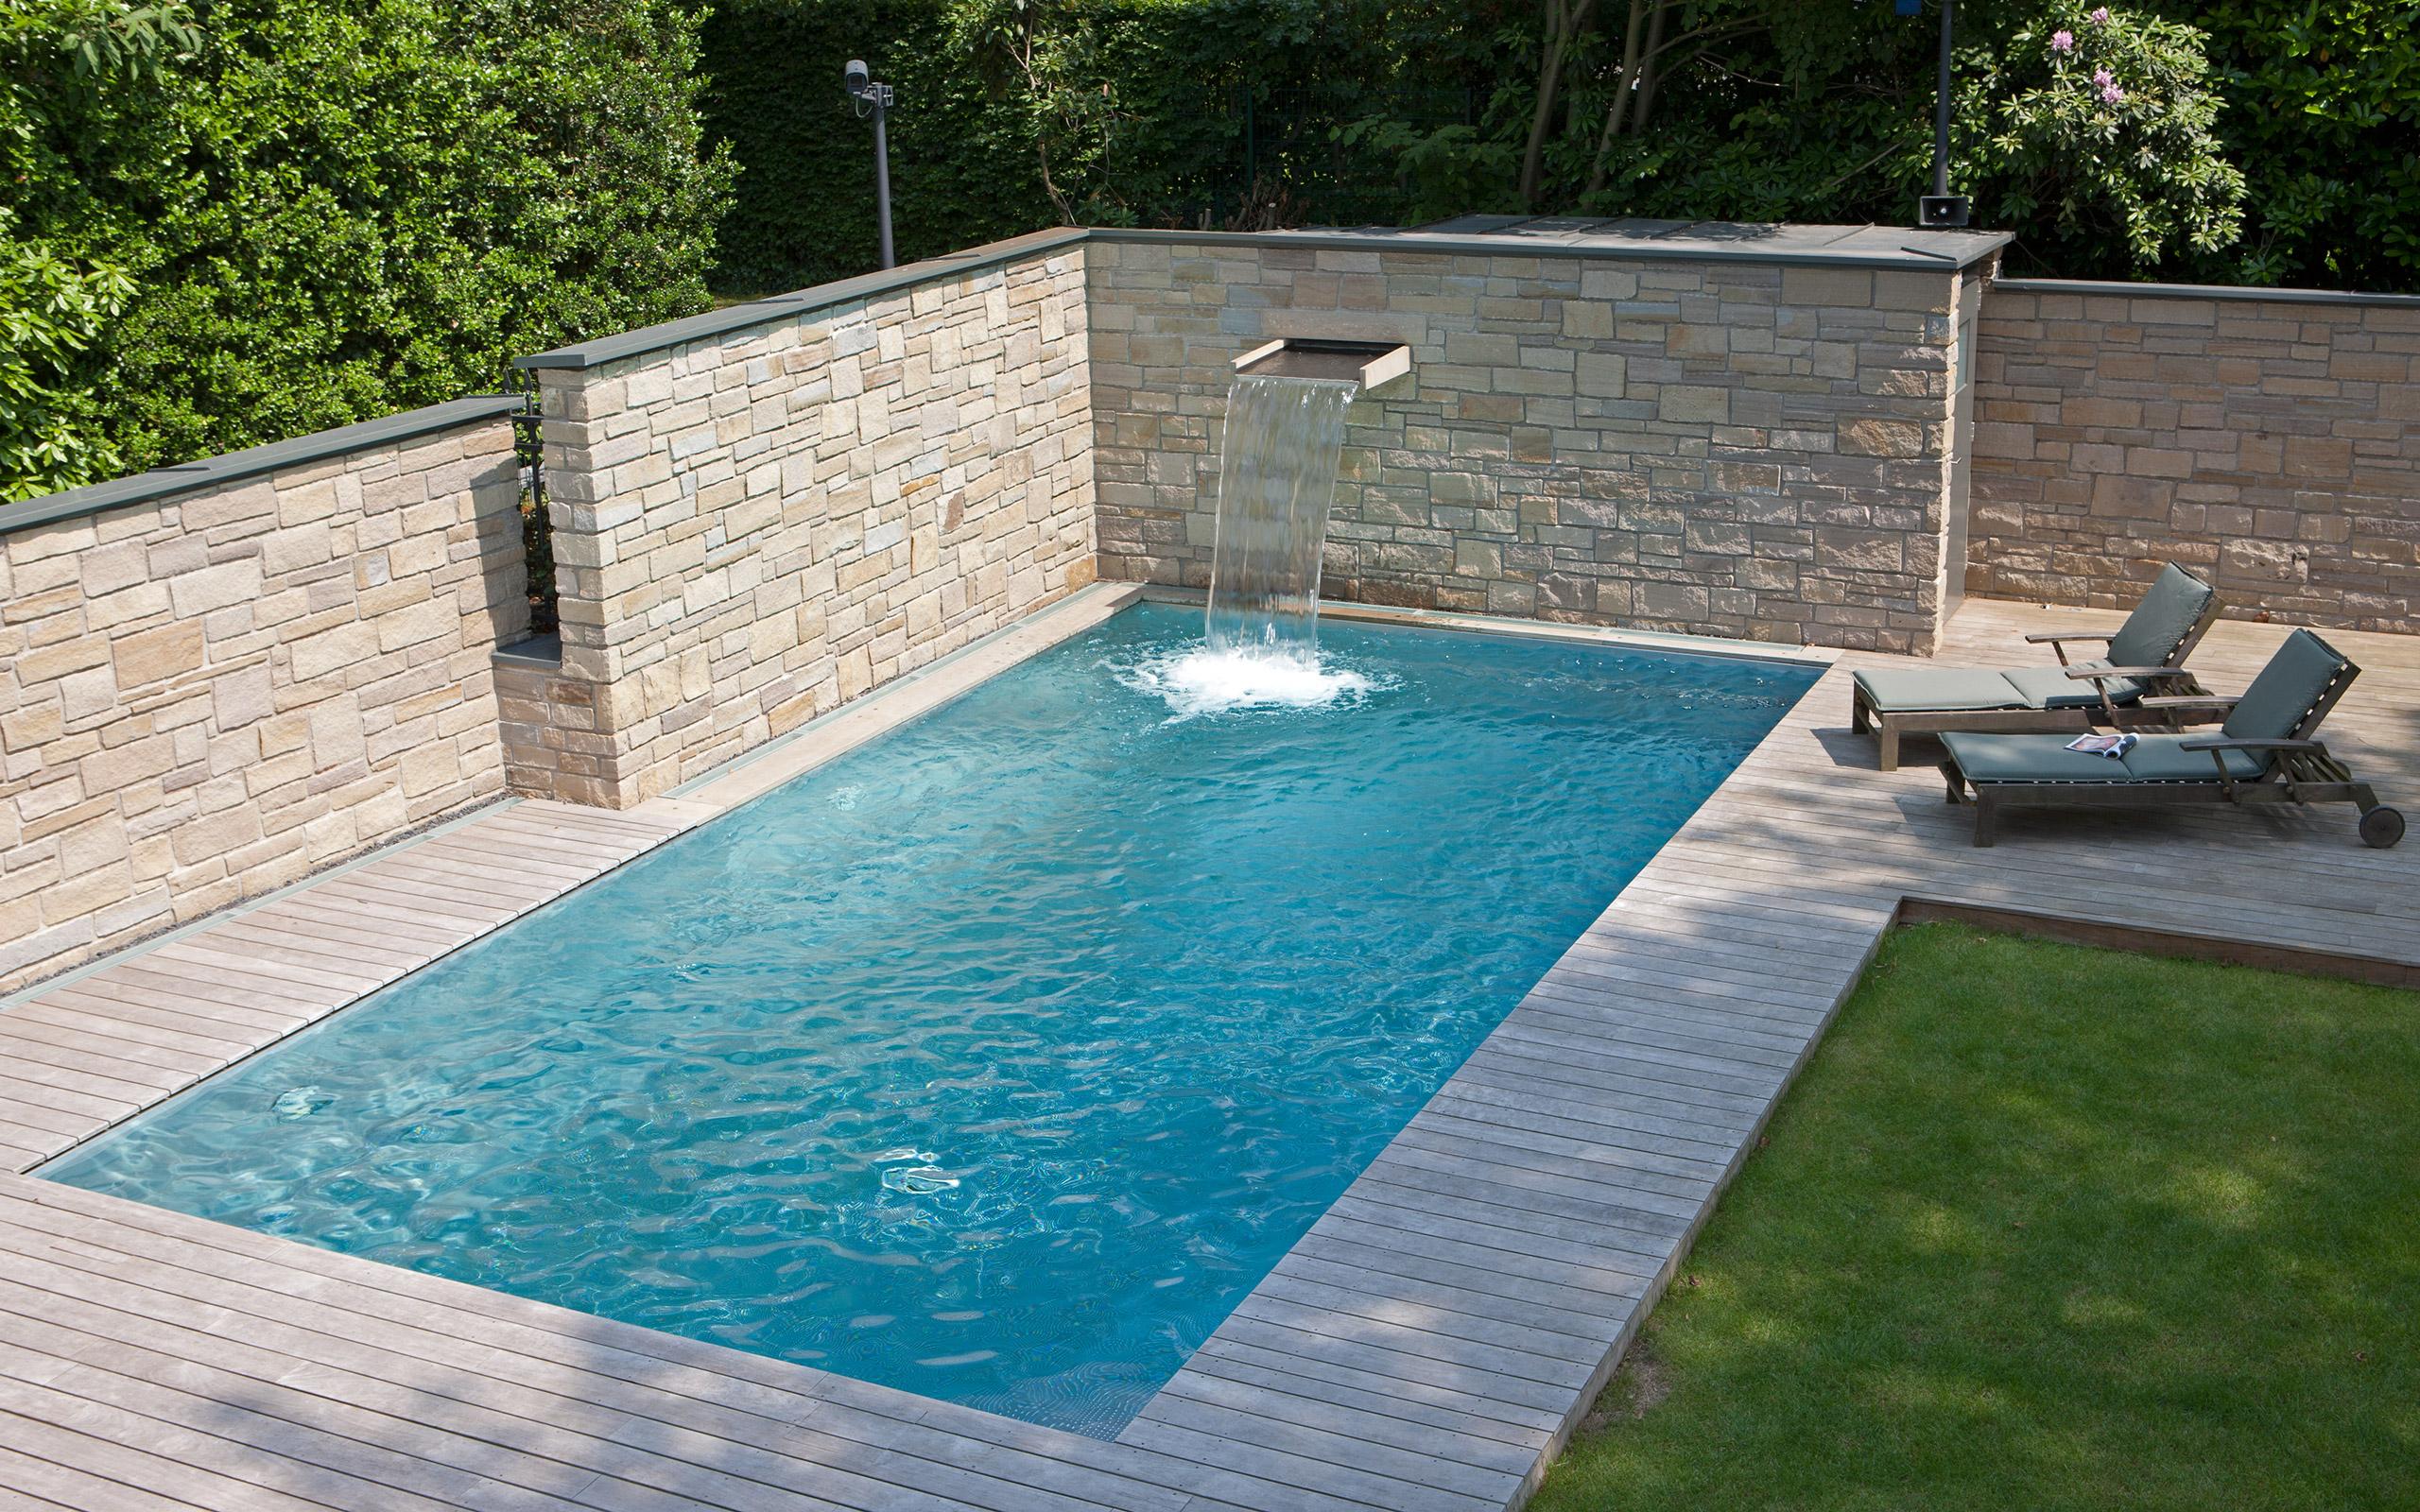 best holzumrandung pool selber bauen gallery. Black Bedroom Furniture Sets. Home Design Ideas